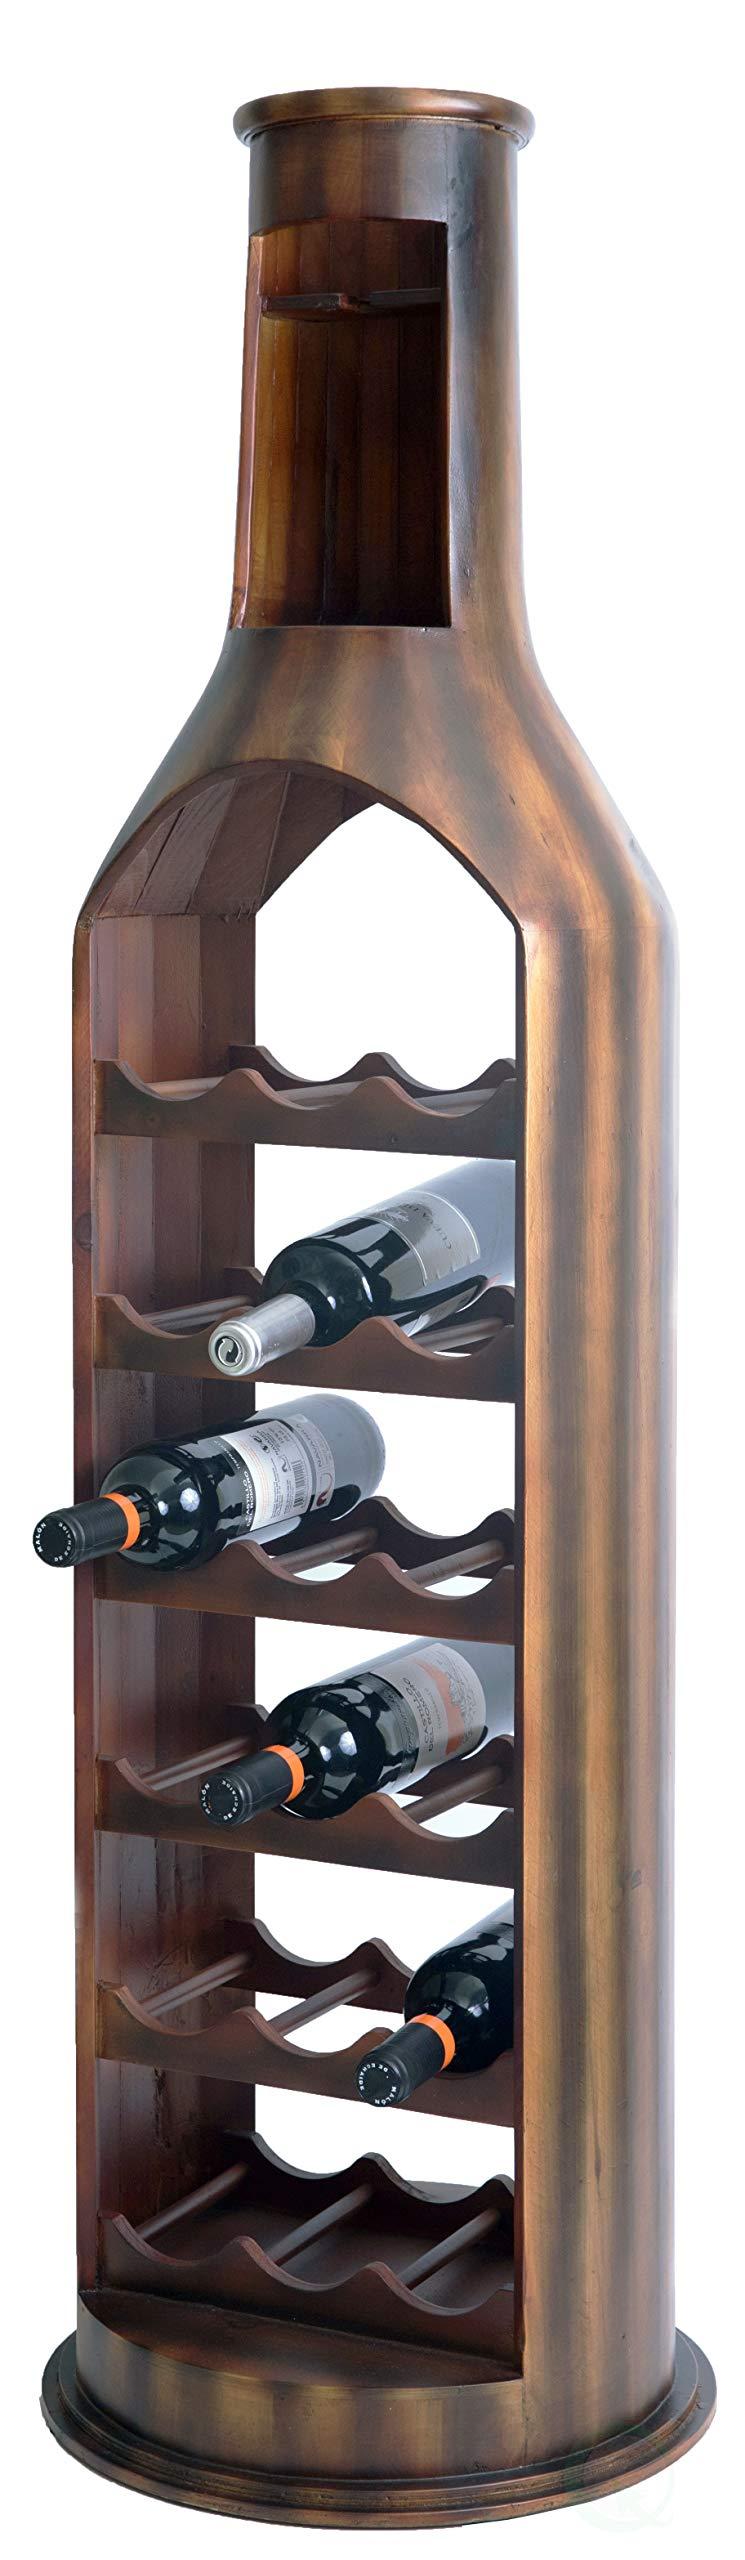 Vintiquewise QI003343LNEW 10 Bottle Decorative Holder Wooden Violin Shaped Wine Rack, Brown by Vintiquewise